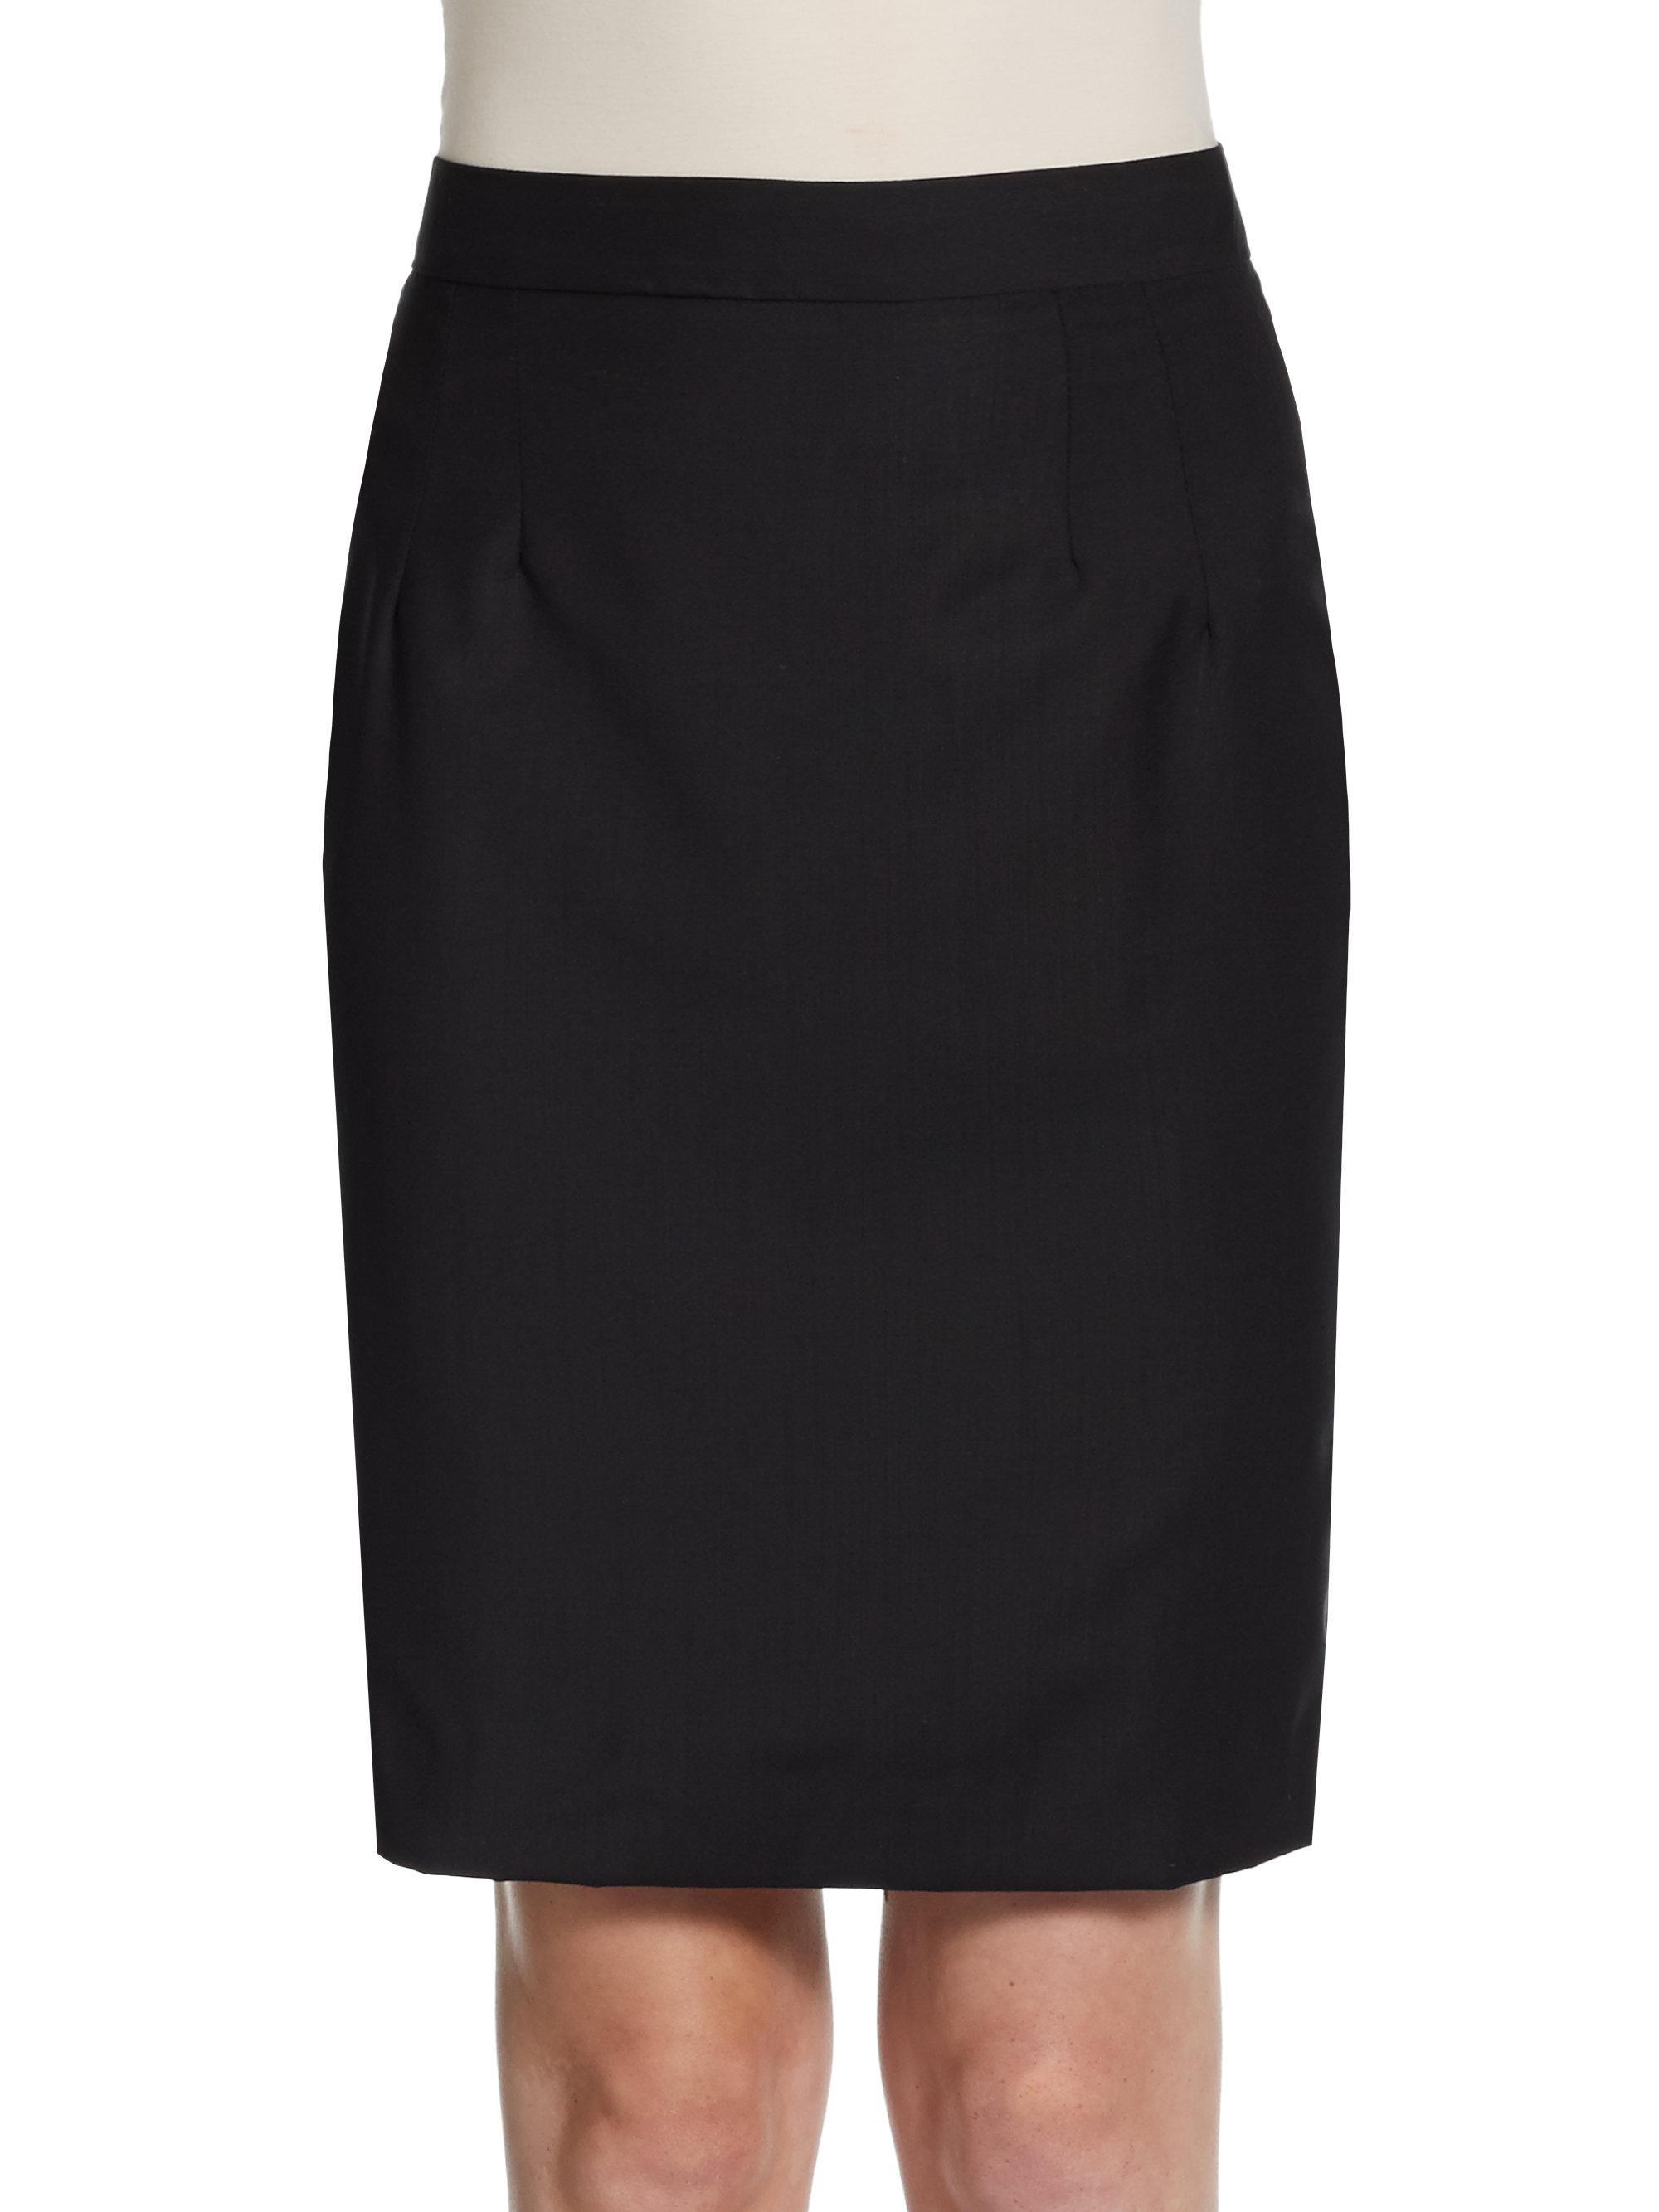 dolce gabbana wool pencil skirt in black lyst